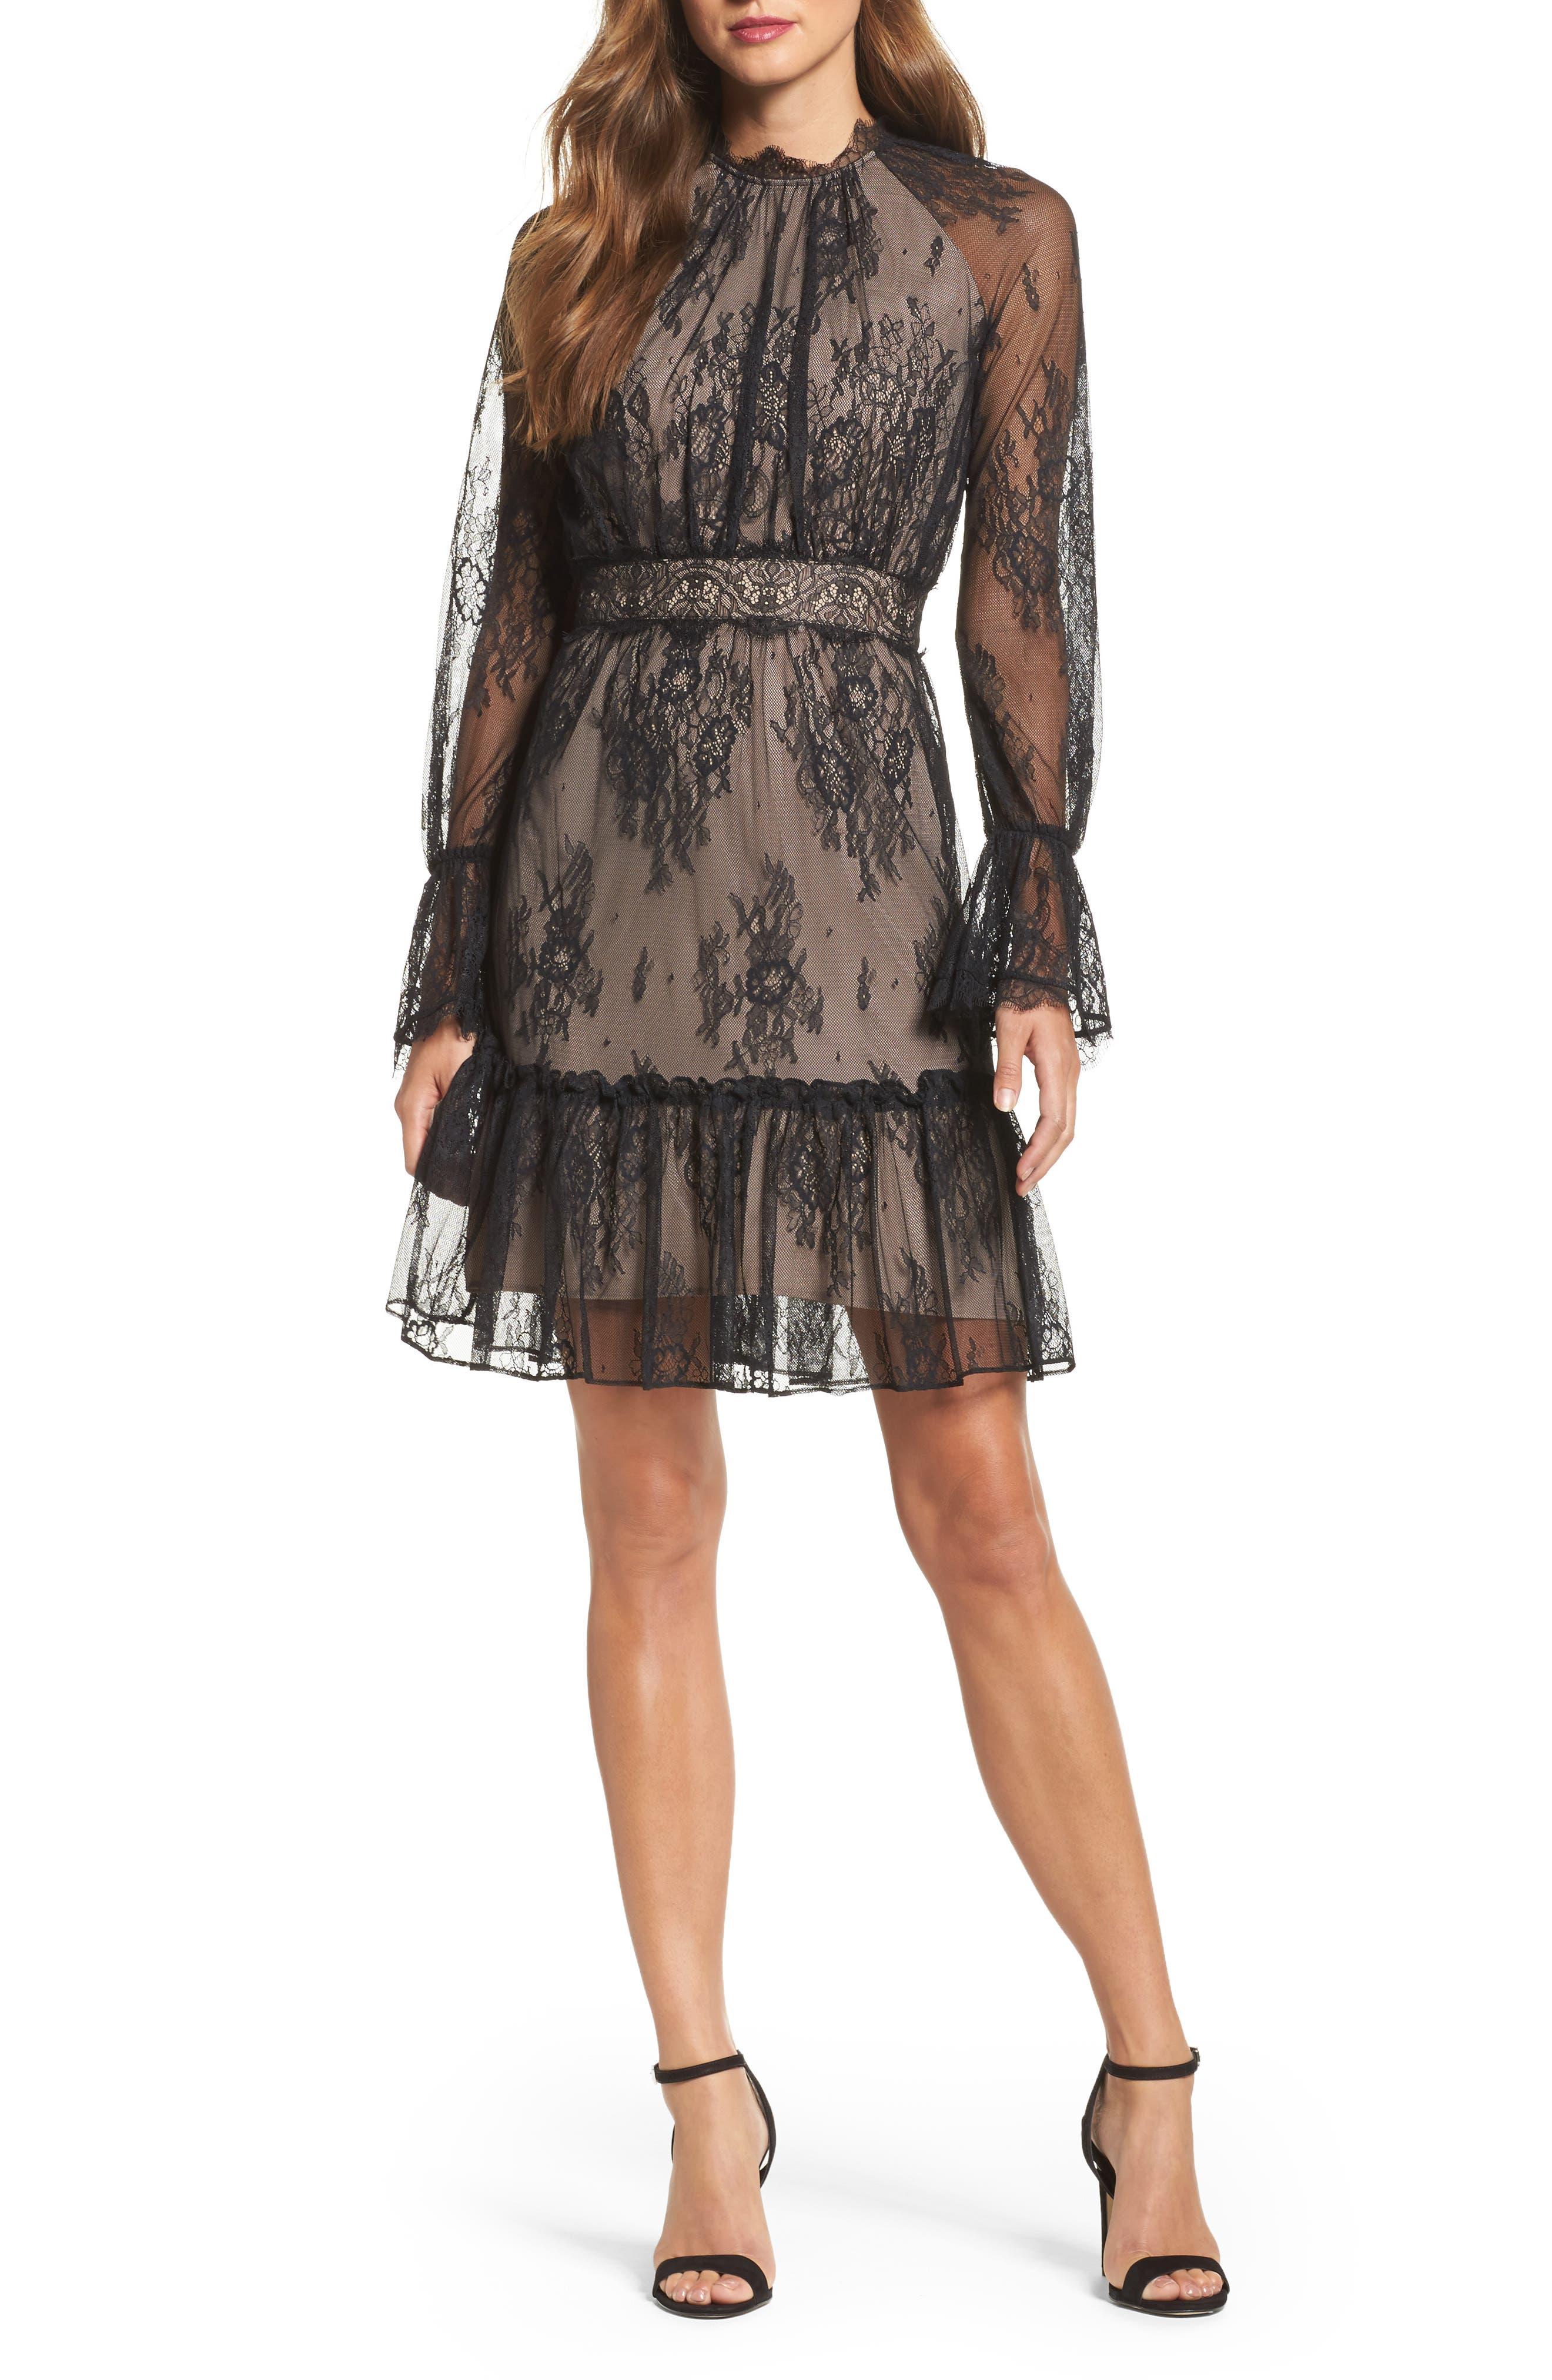 Shoshanna Floral Medallion Lace Fit & Flare Dress